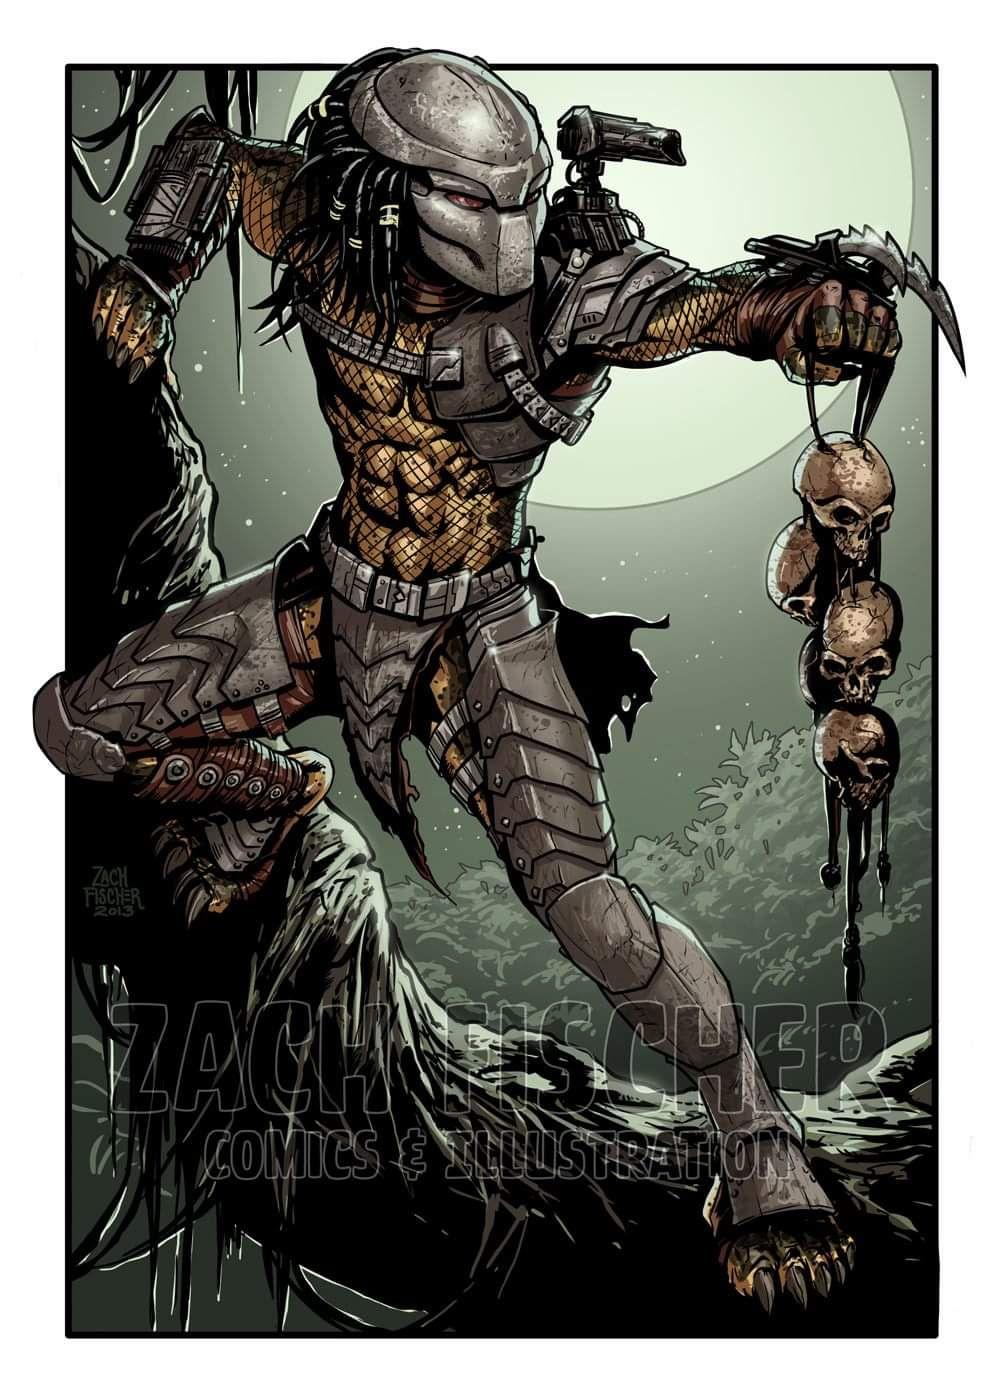 Pin by Gwar Rules on predators   Predator art, Alien vs